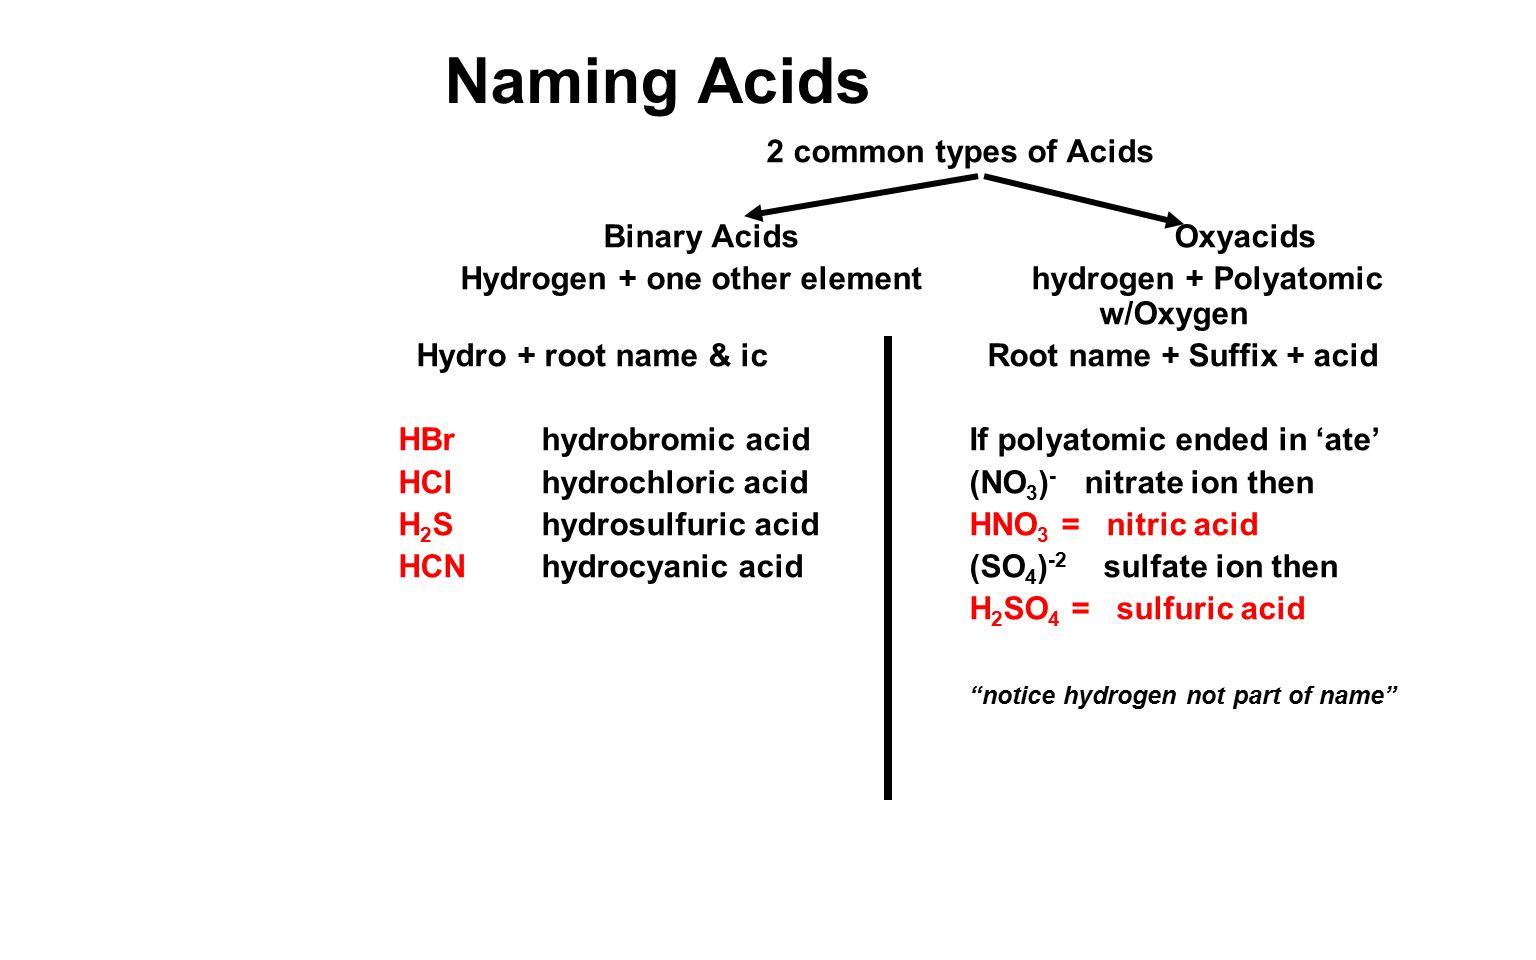 Worksheets Acid Nomenclature Worksheet Cheatslist Free